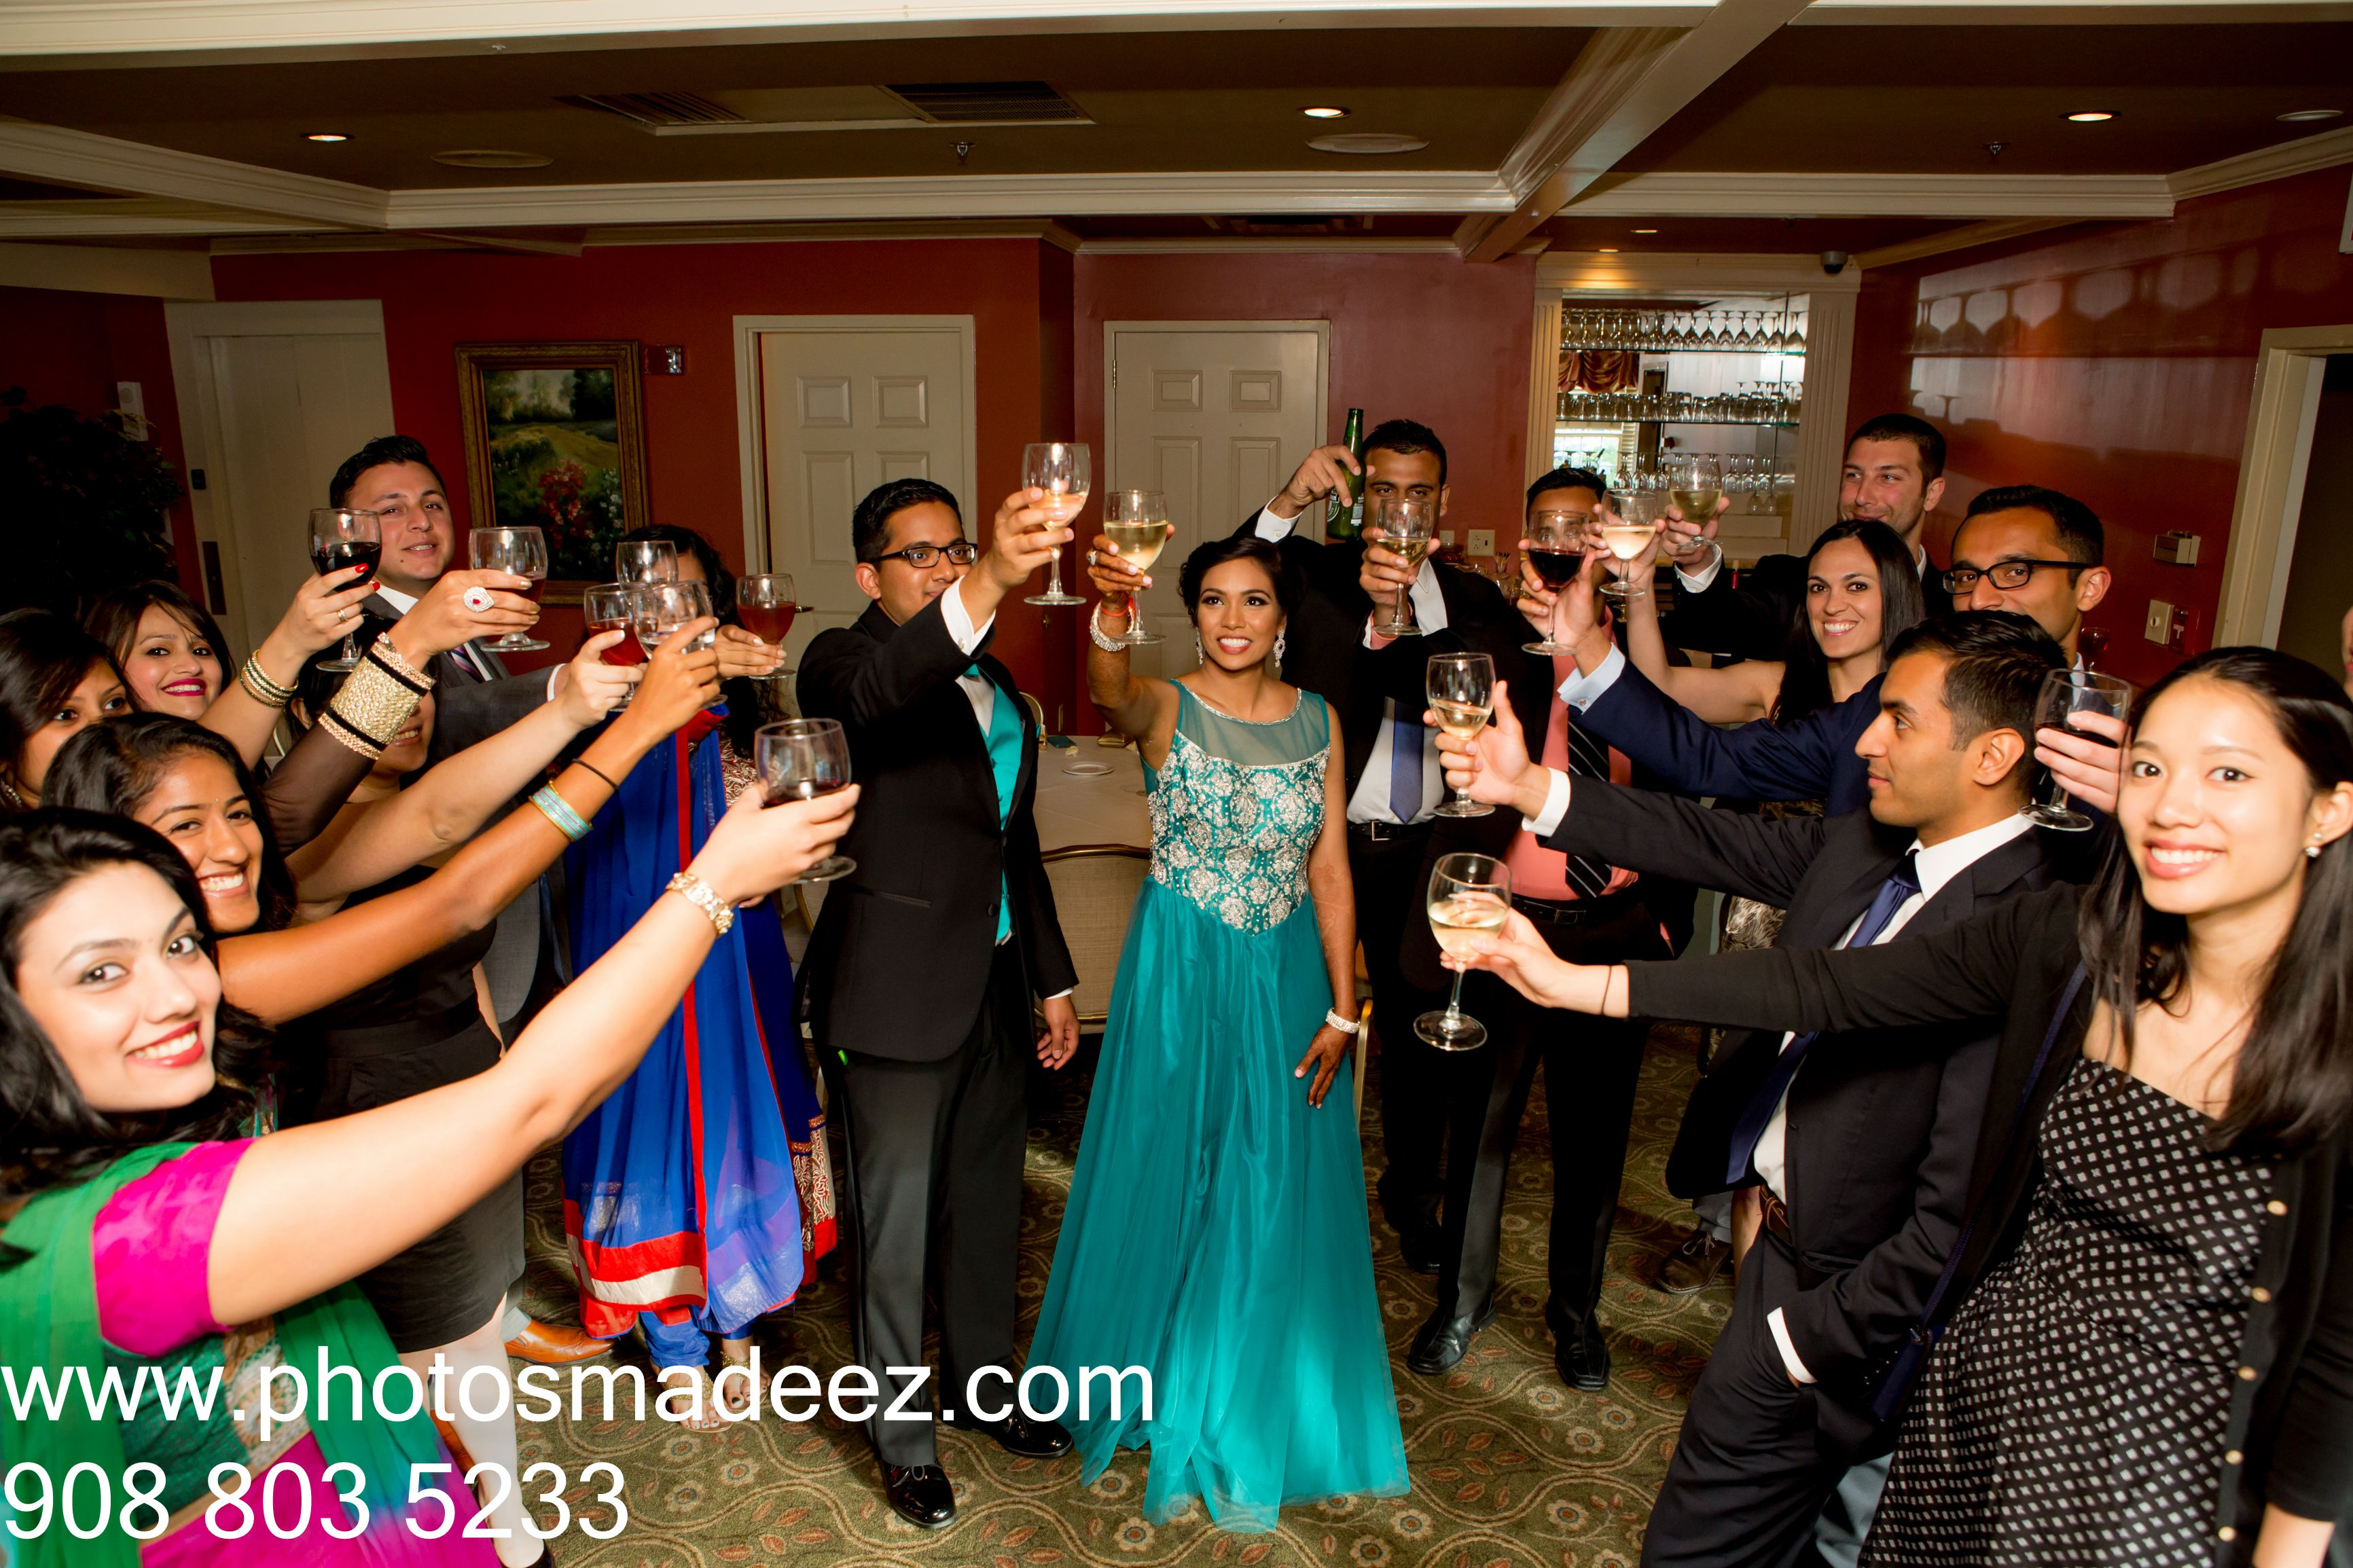 Bride and Groom toasting at Indian Wedding Reception at Springfield Country Club. Best Wedding Photographer PhotosMadeEz . Award Winning Photographer Mou Mukherjee . Bridal make up by Sanjana Vaswani, DJ Gaurav and event coodrinated by One Events Mgmt #meghahemal2015